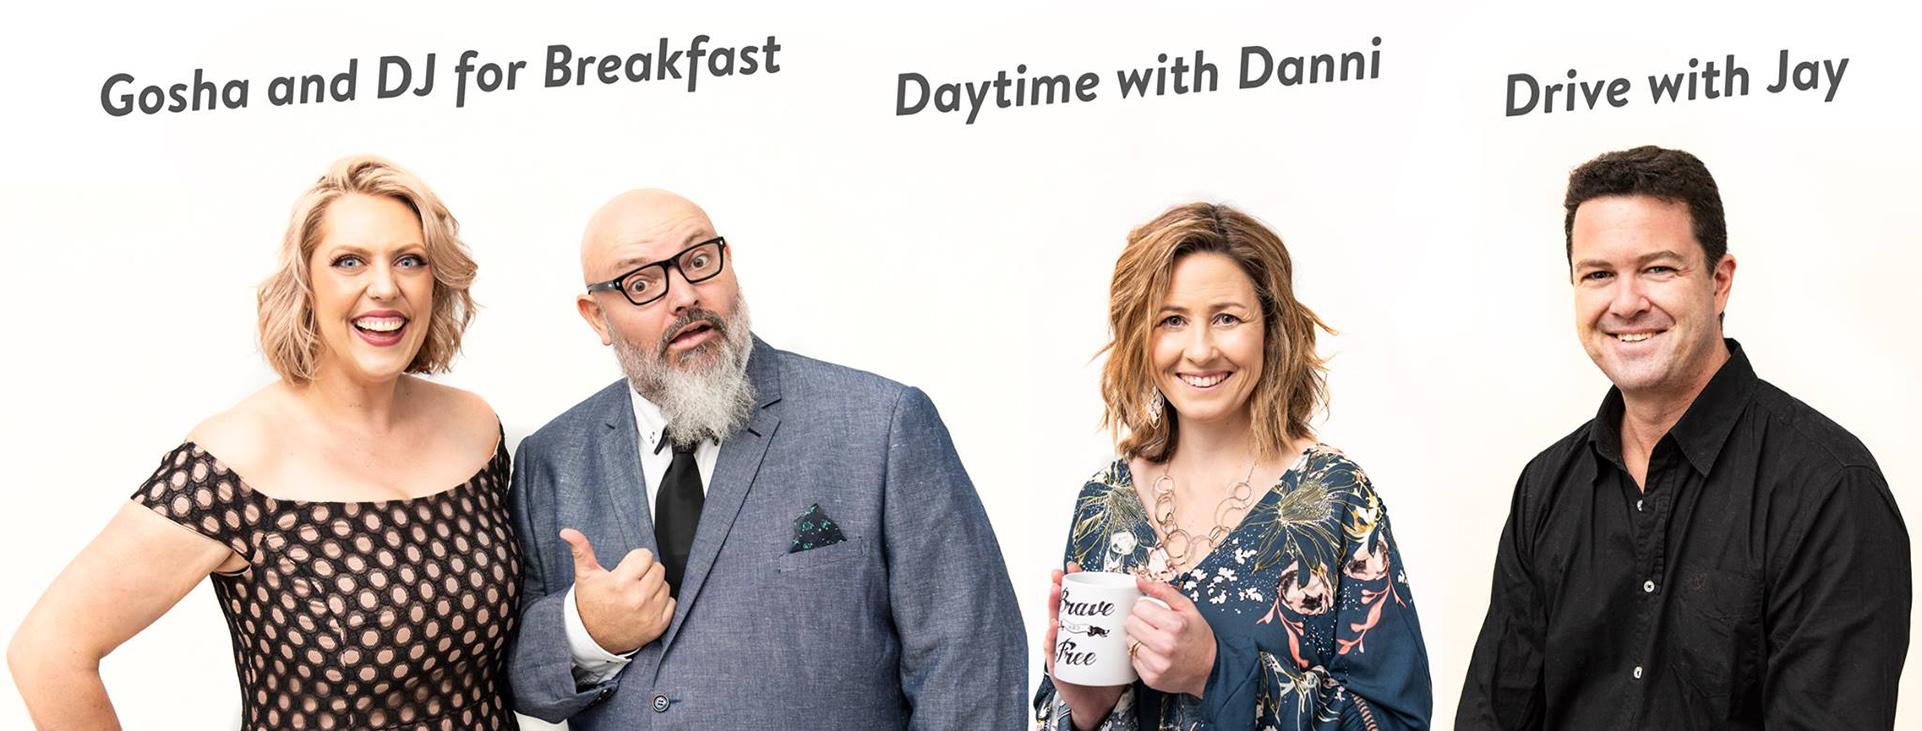 Daytime-lineup-2018-September